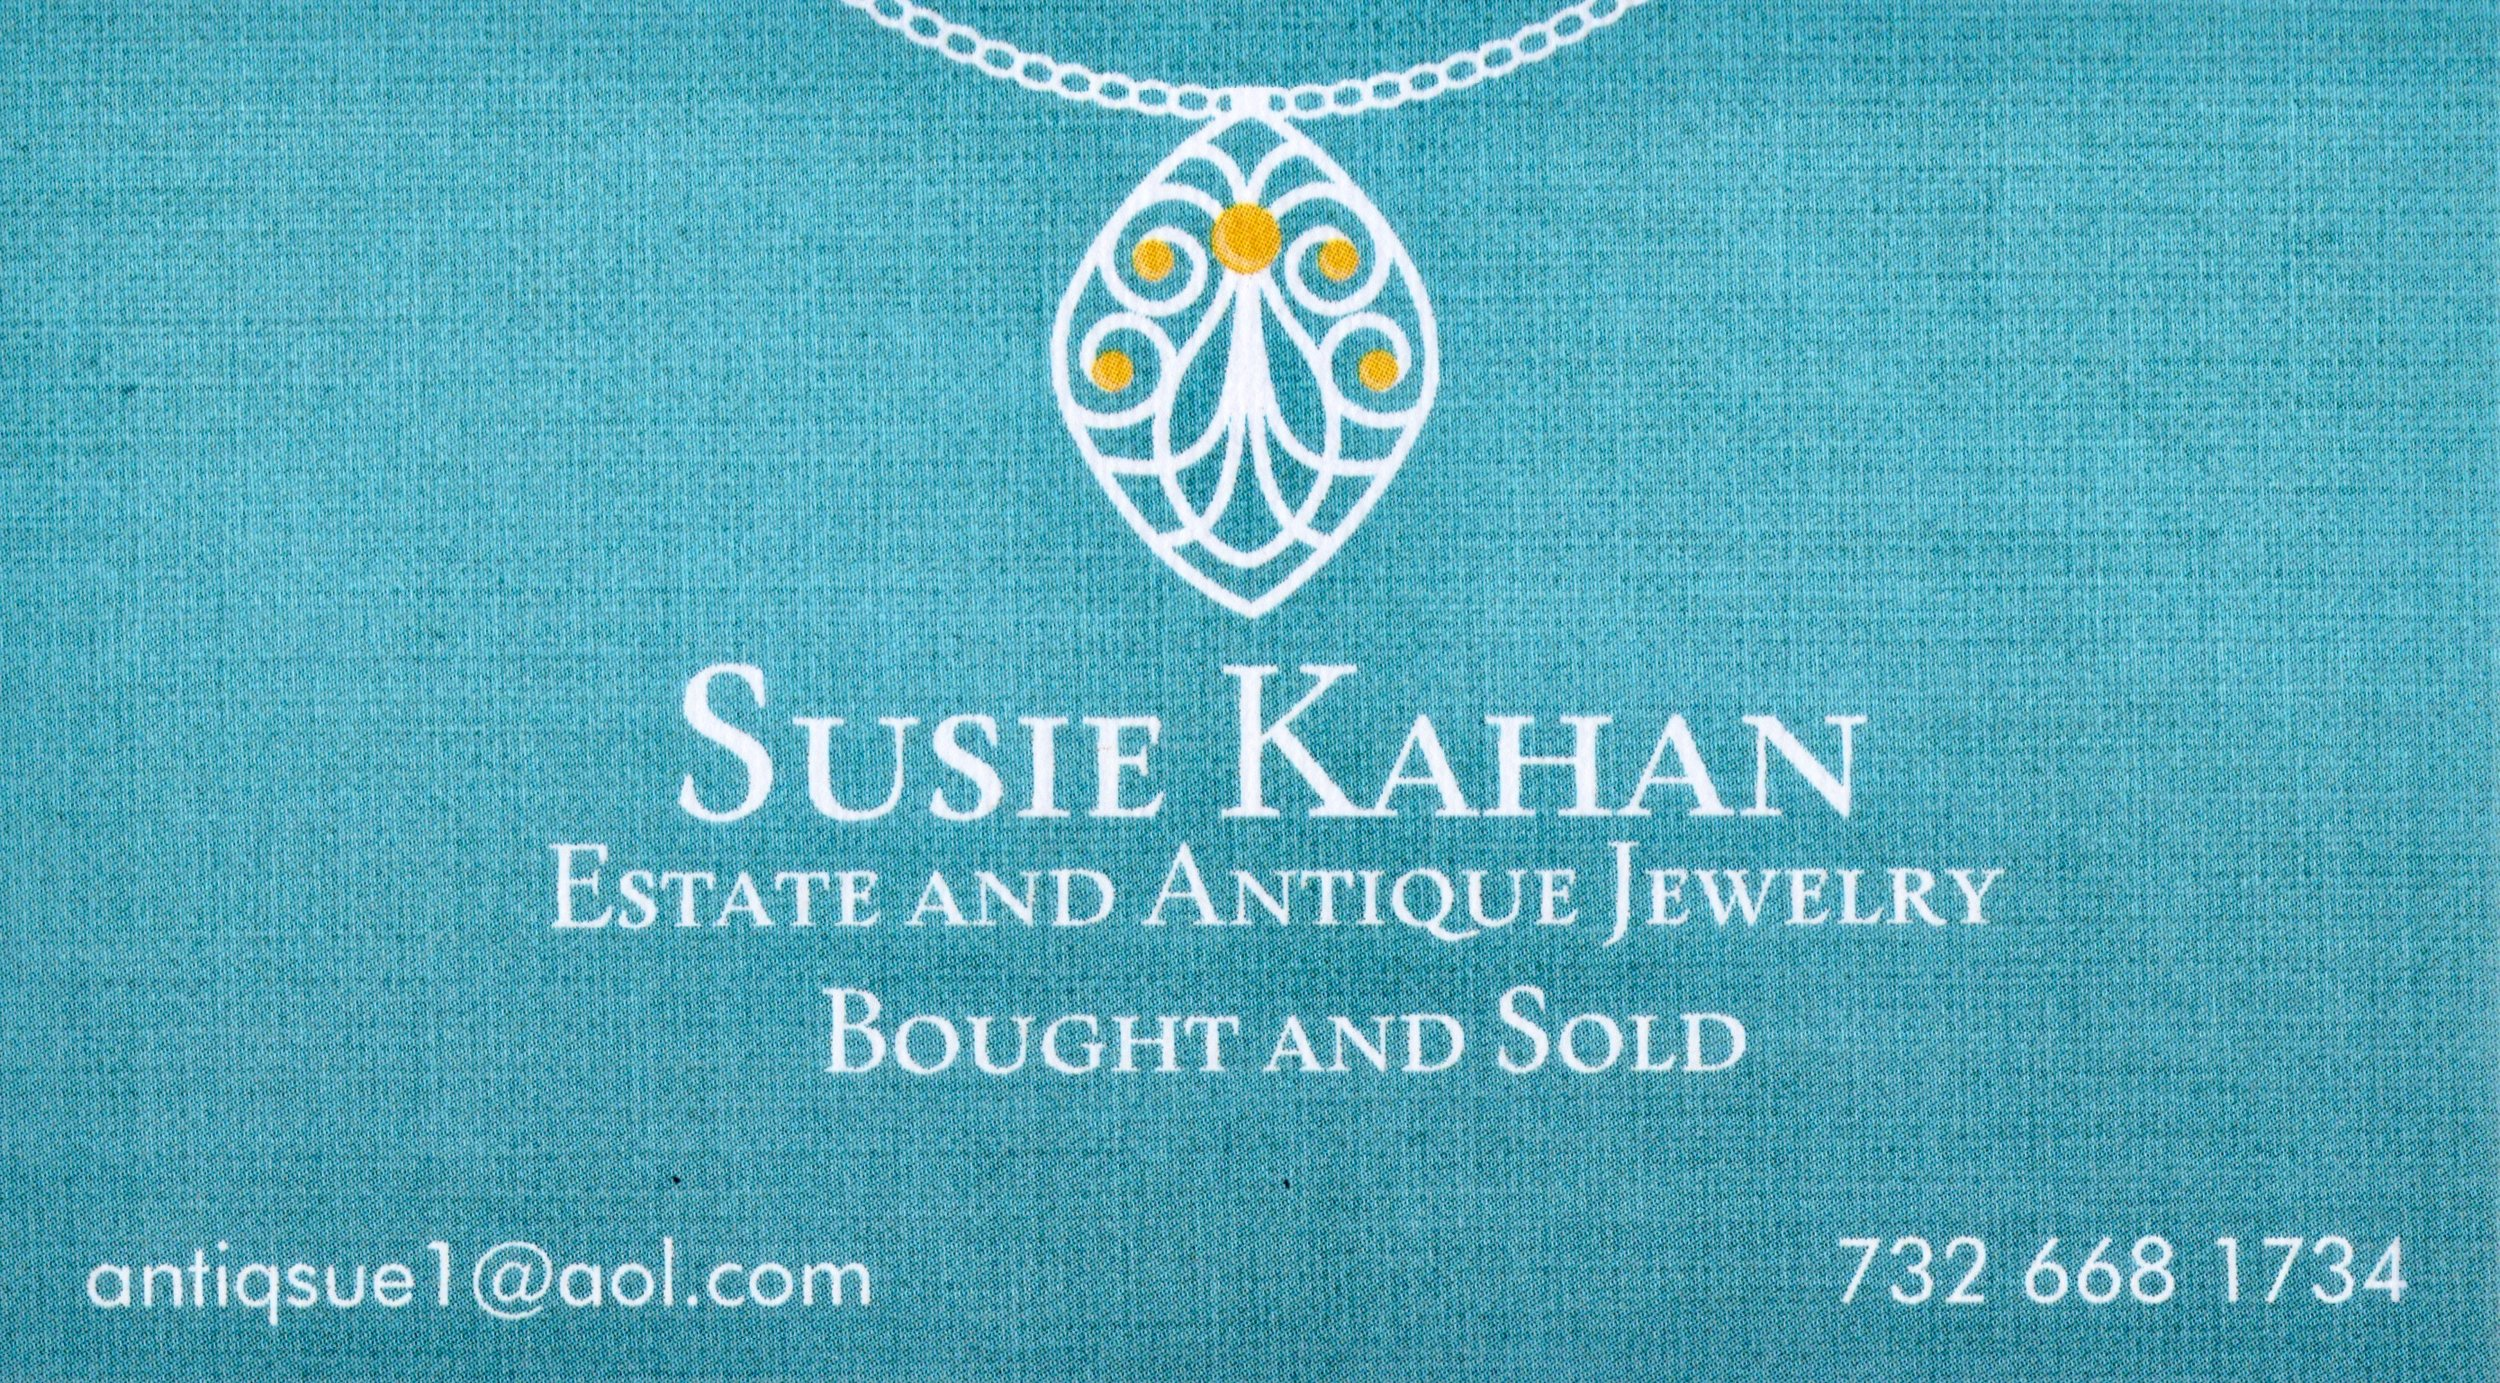 SUSIE KAHAN JEWELRY